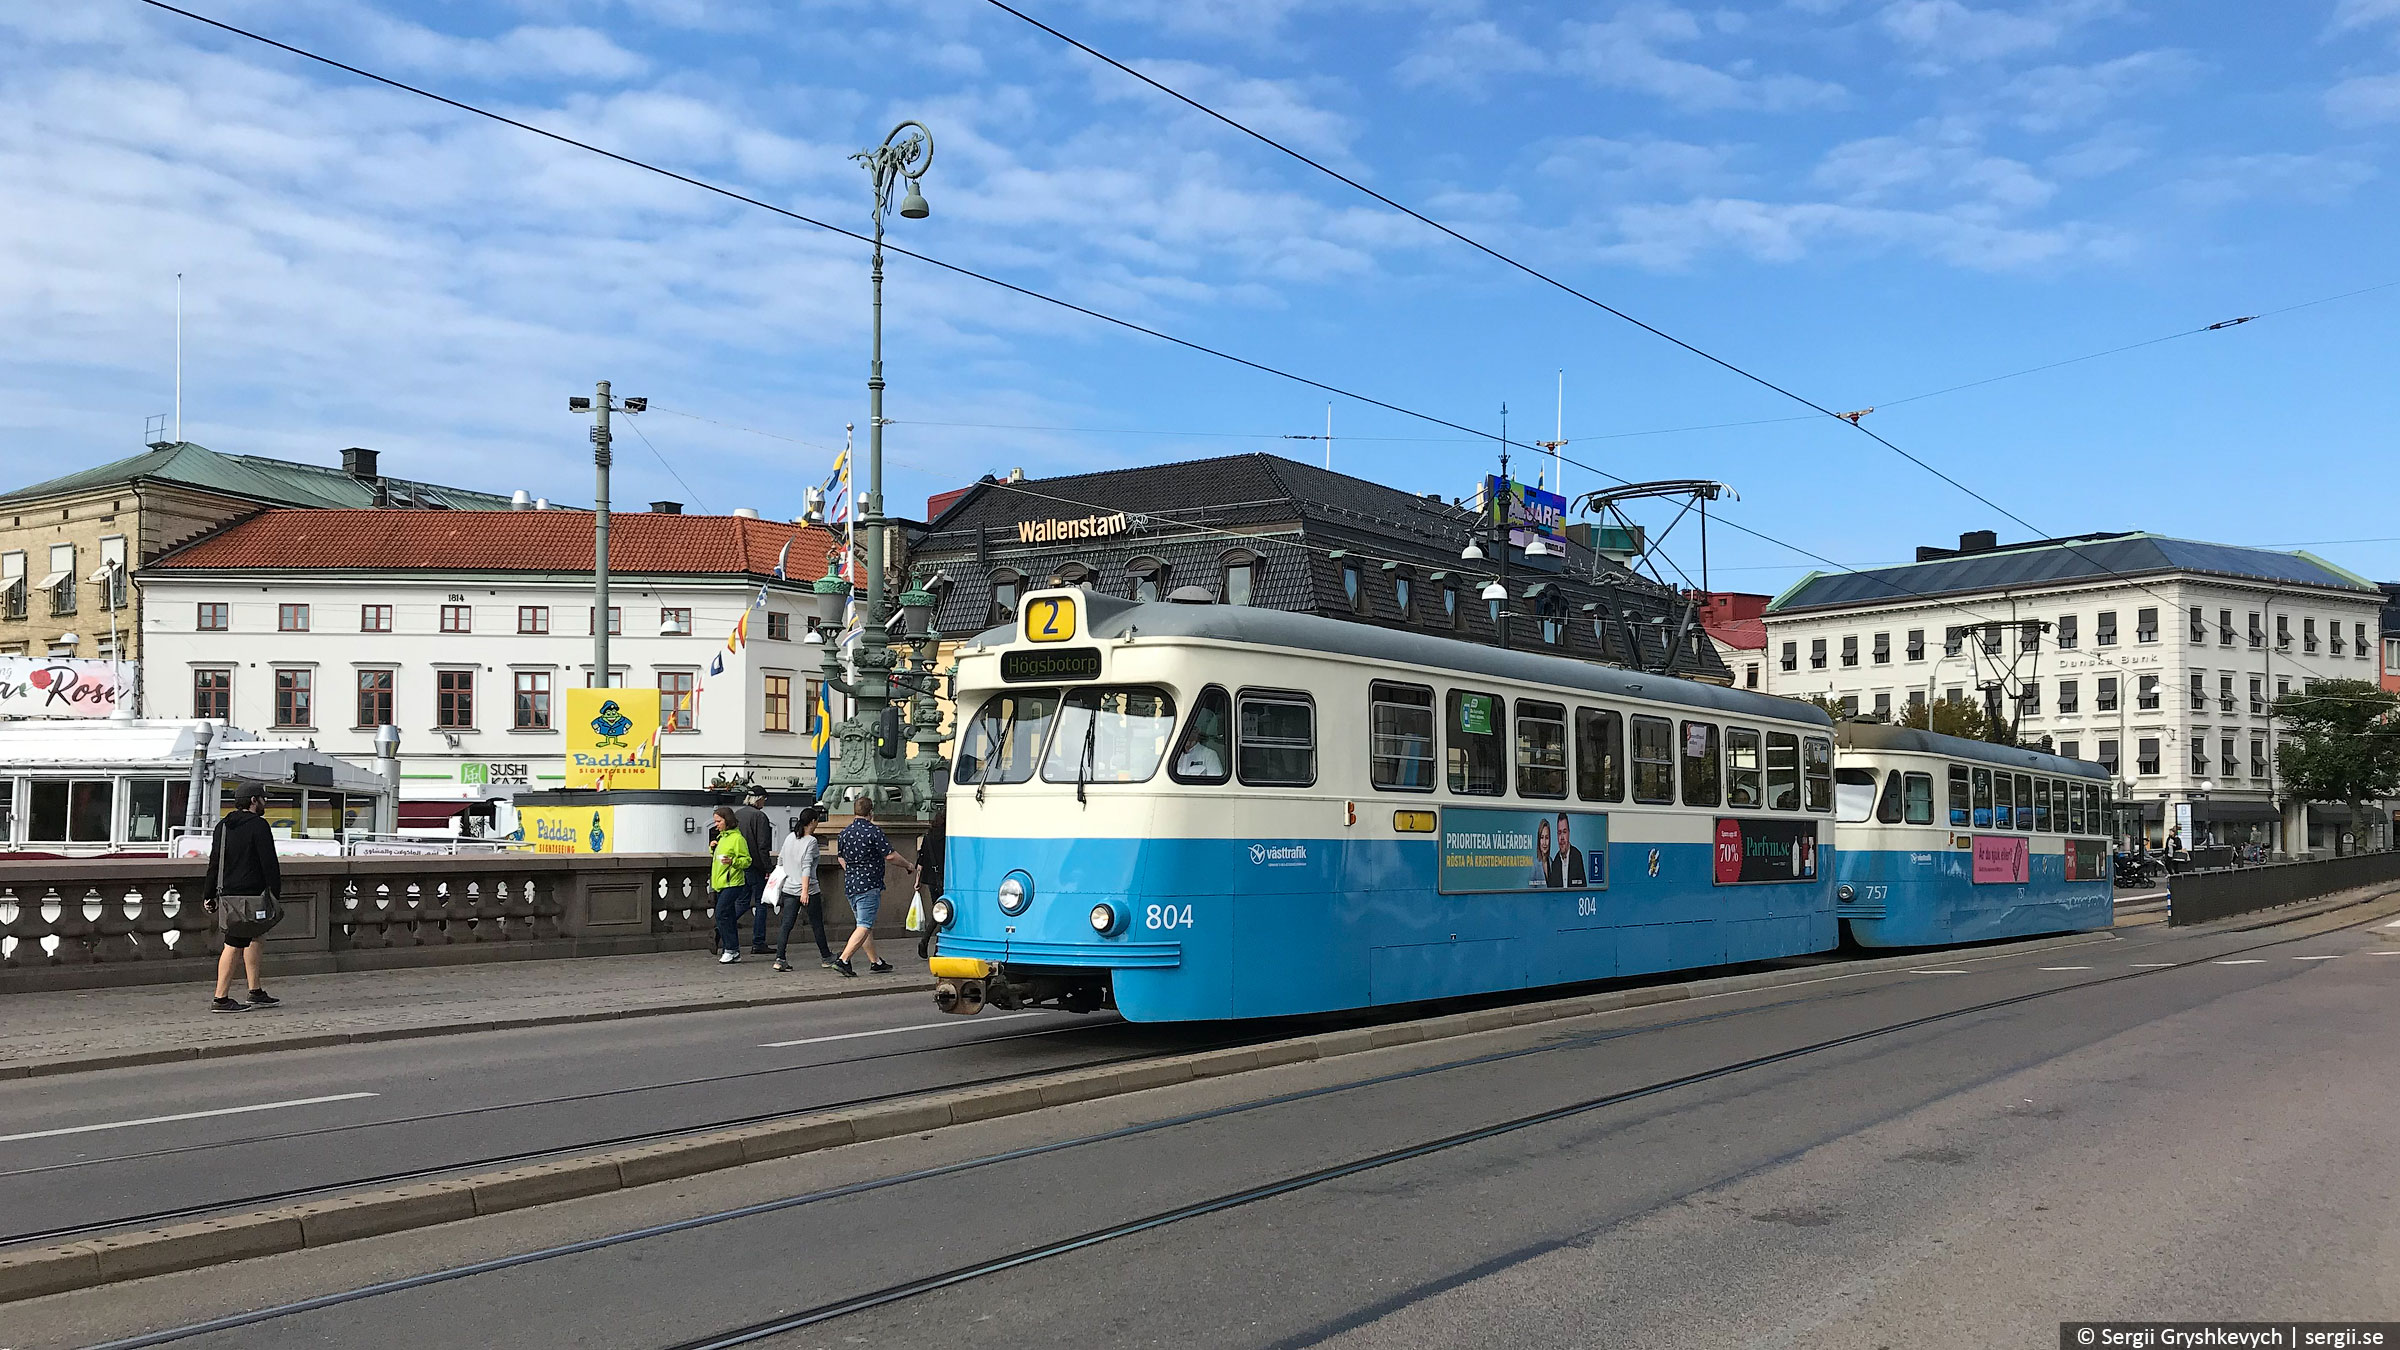 göteborg-ghotenburg-sweden-2018-8